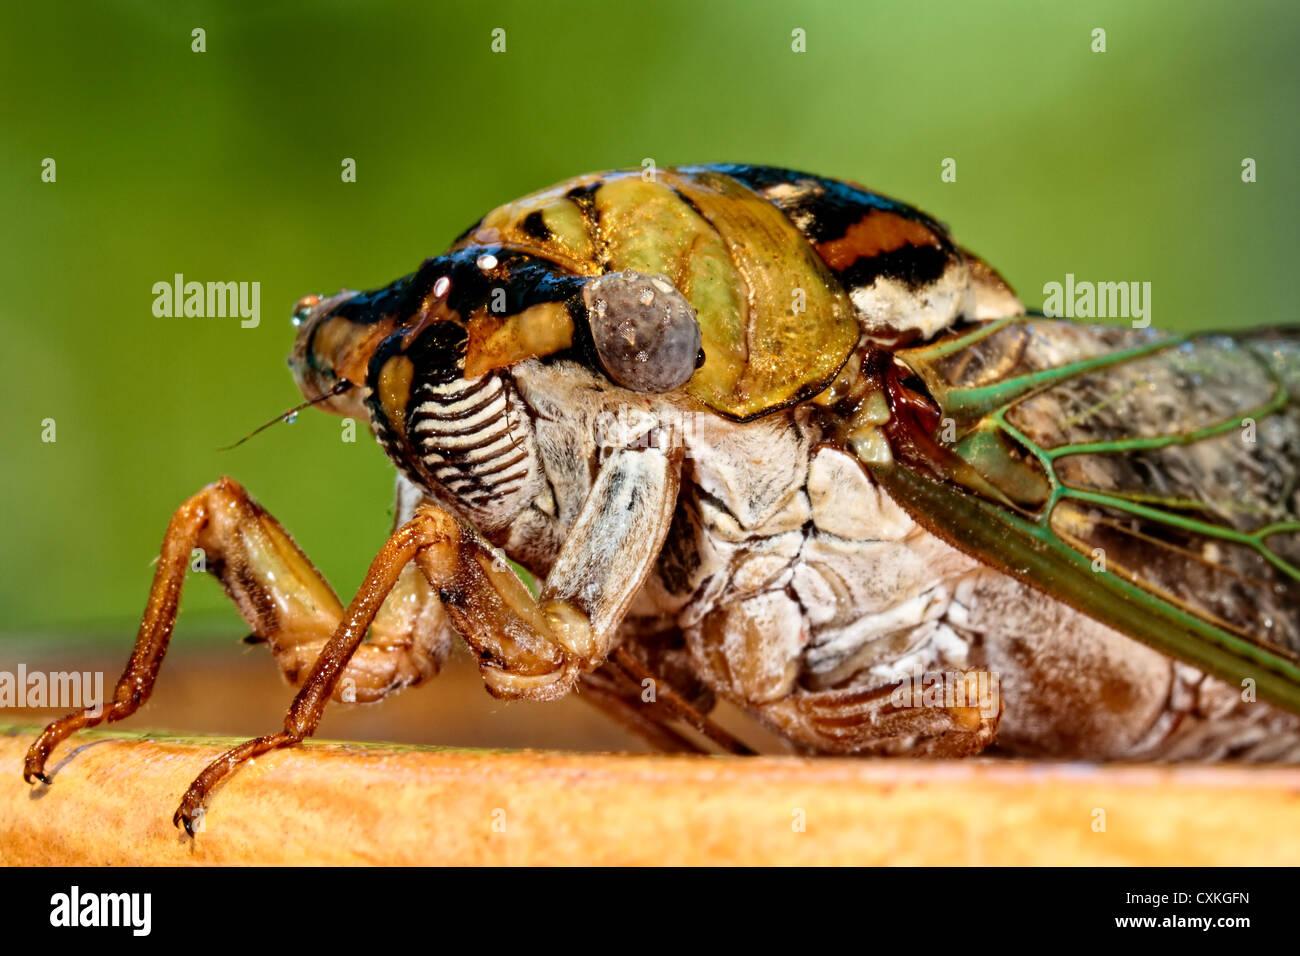 Close up of a Cicada - Stock Image